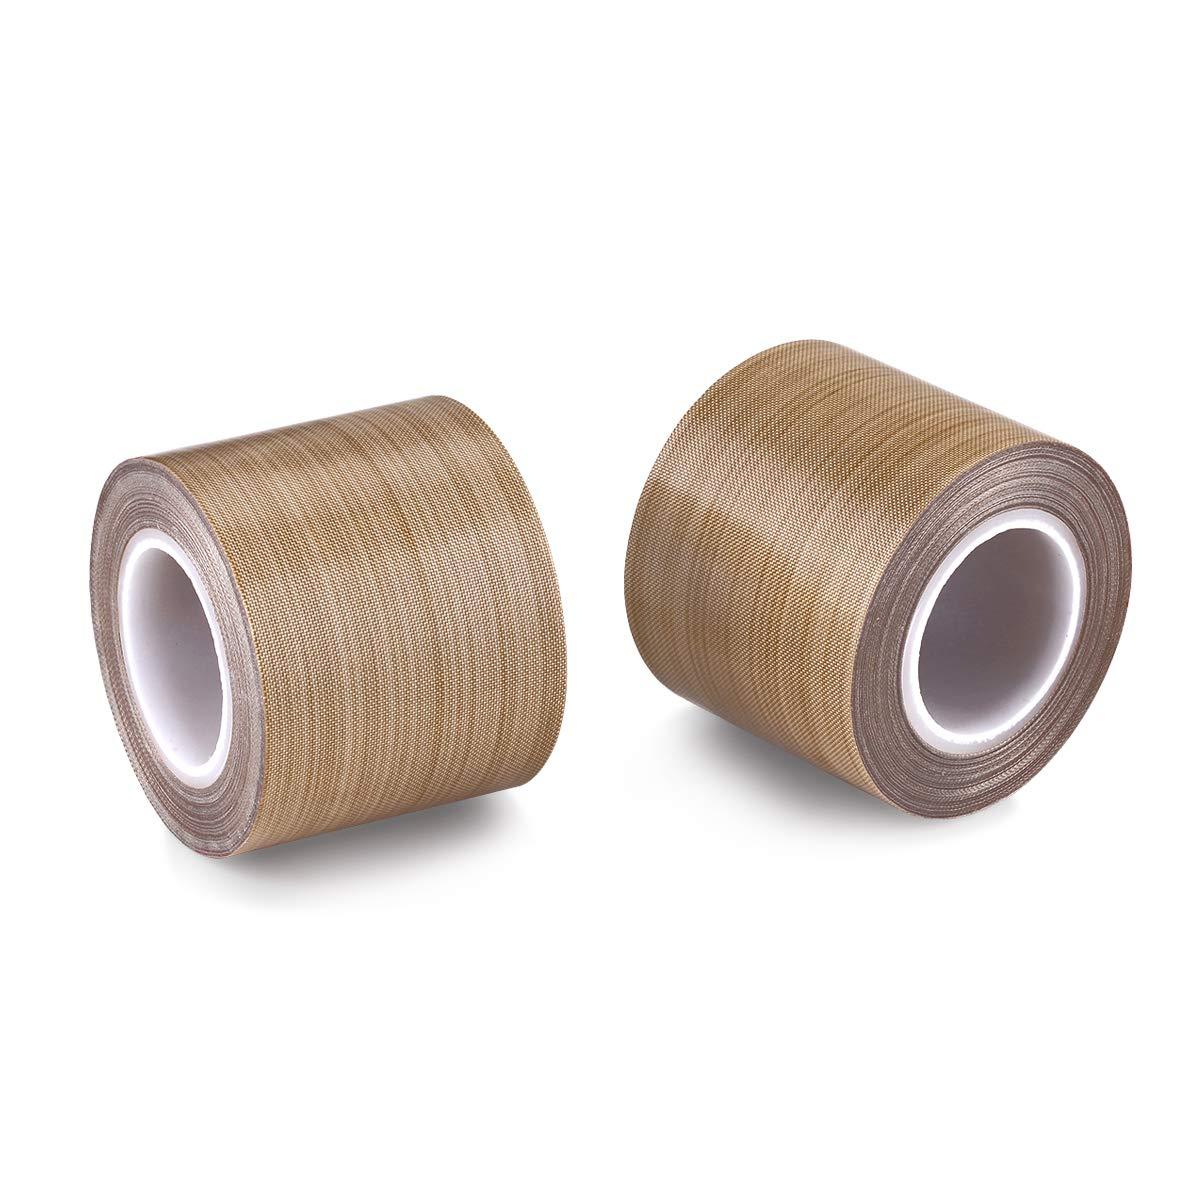 PTFE Coated Fiberglass Telfon Tape,high Temperature Tape;Drying Mechanical Conveyor Belt; Welding Sealing Tape; -196℃ +300℃ /… Shanghai Sencol Technology Co Brown, 25mm x 12yards x 0.18mm LTD ST-TELFON-02